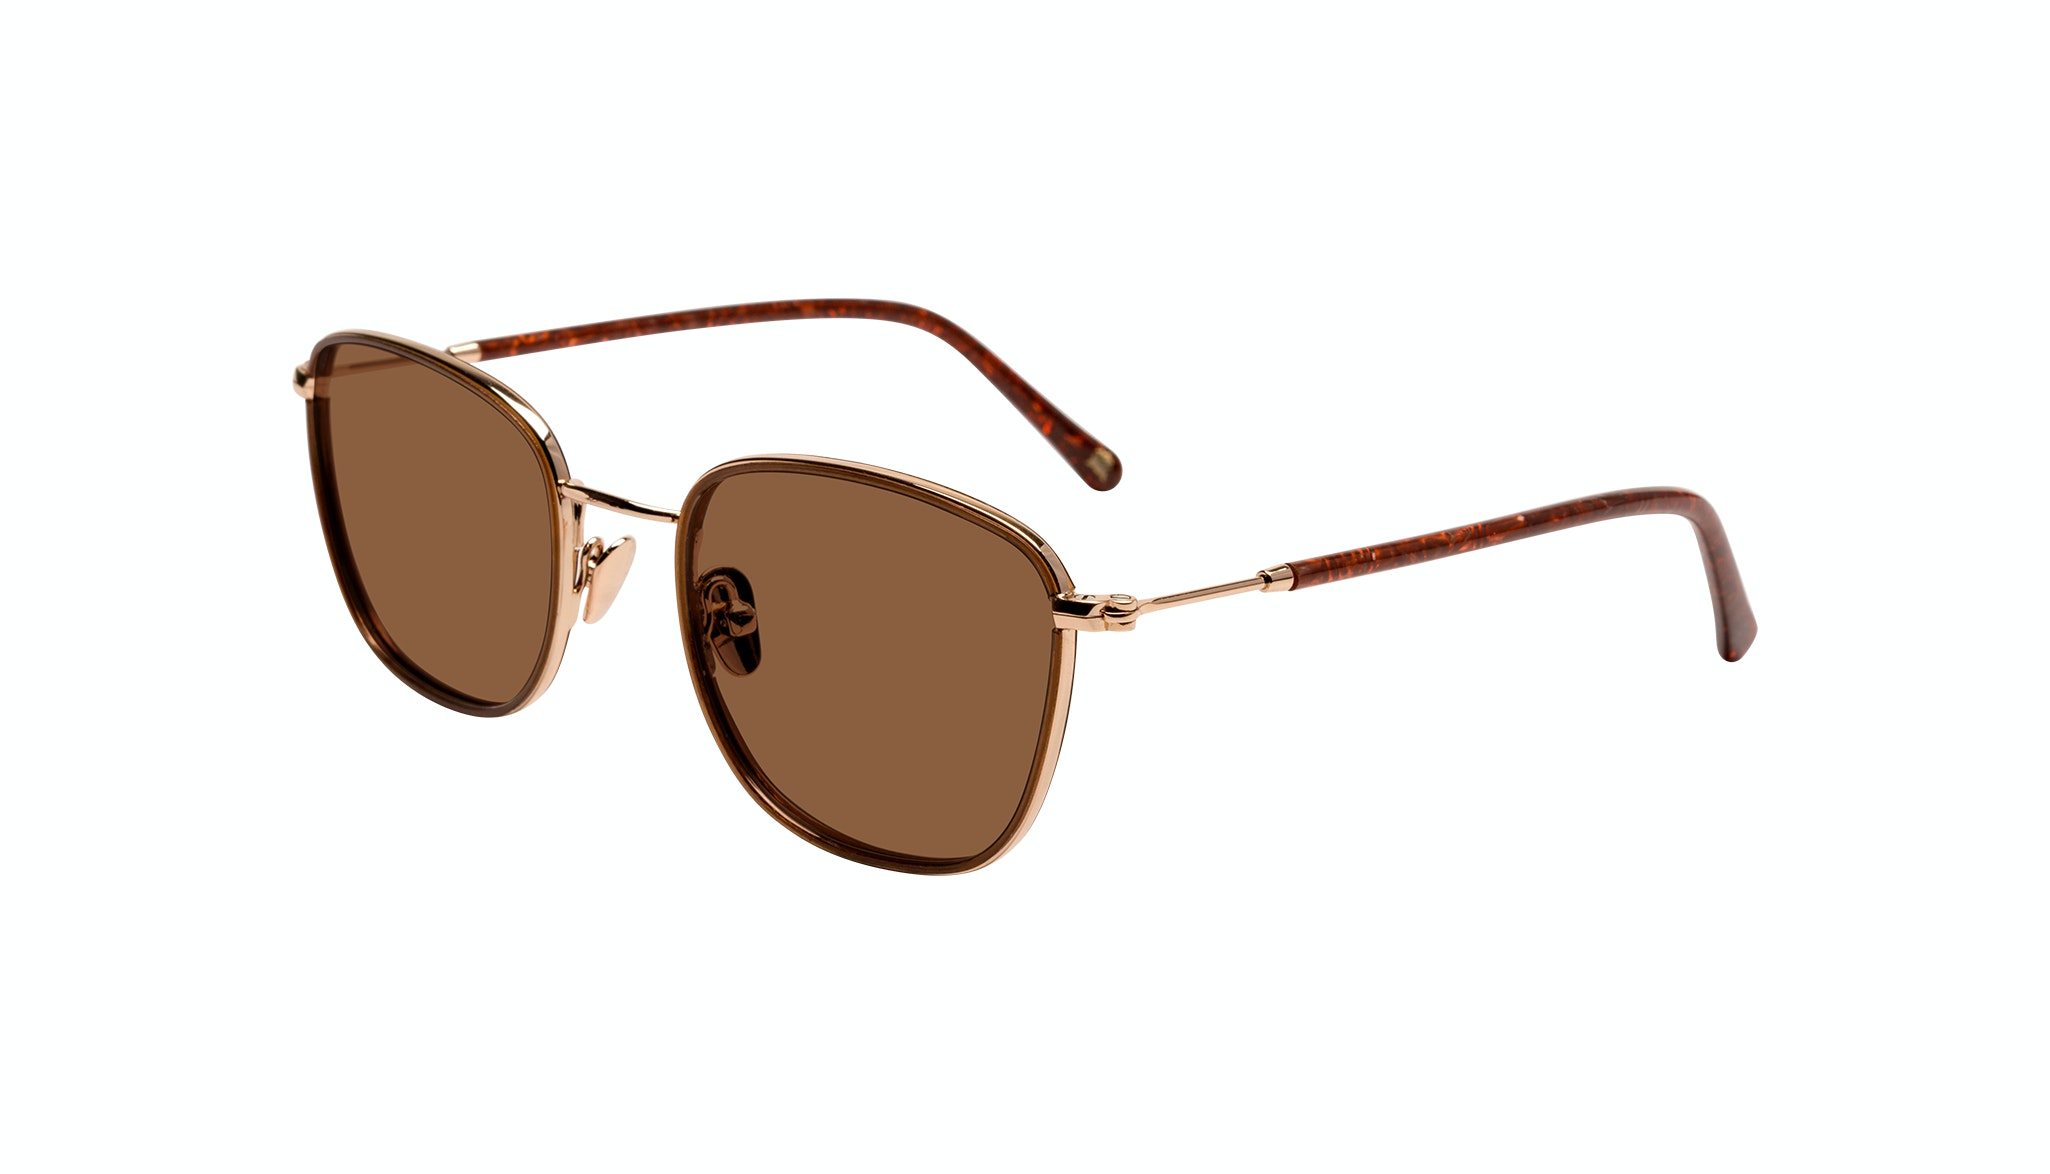 Affordable Fashion Glasses Rectangle Sunglasses Women Lawrence Santal Tilt